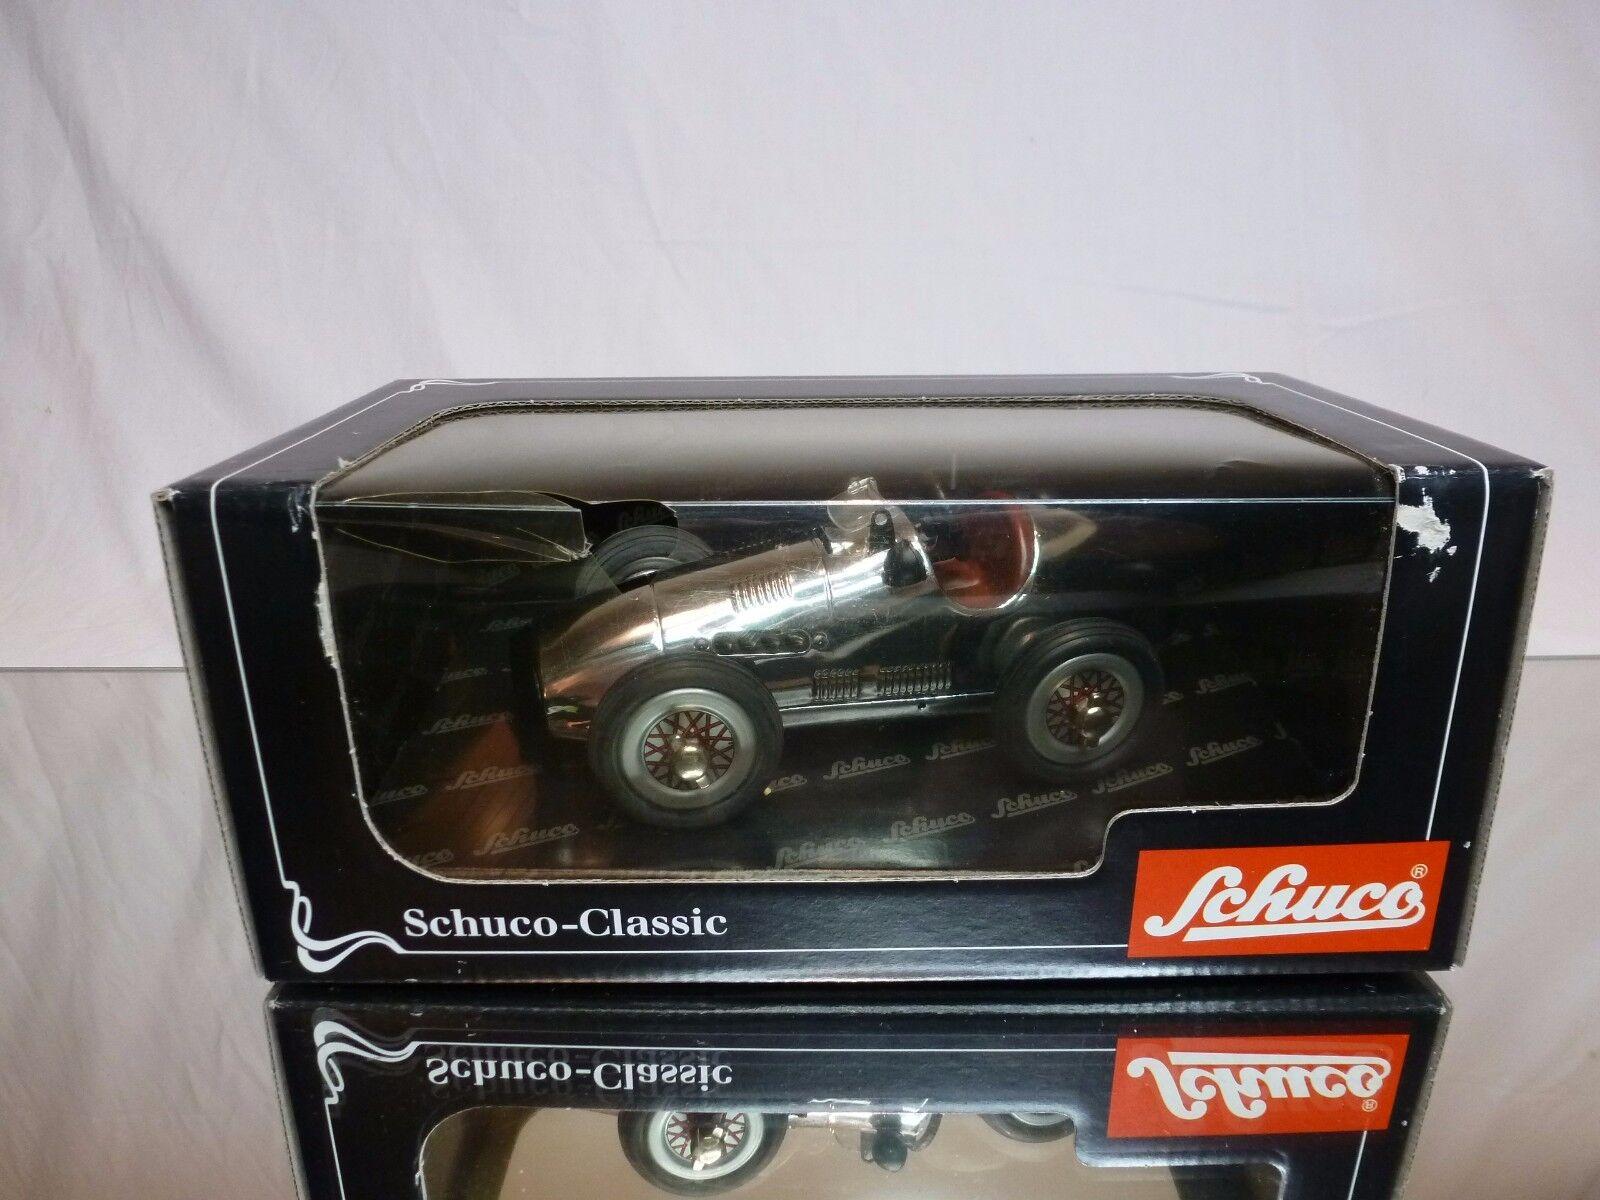 SCHUCO 1023 1070 GRAND PRIX RACER   - - F1 CHROME L16.0cm - EXCELLENT IN BOX